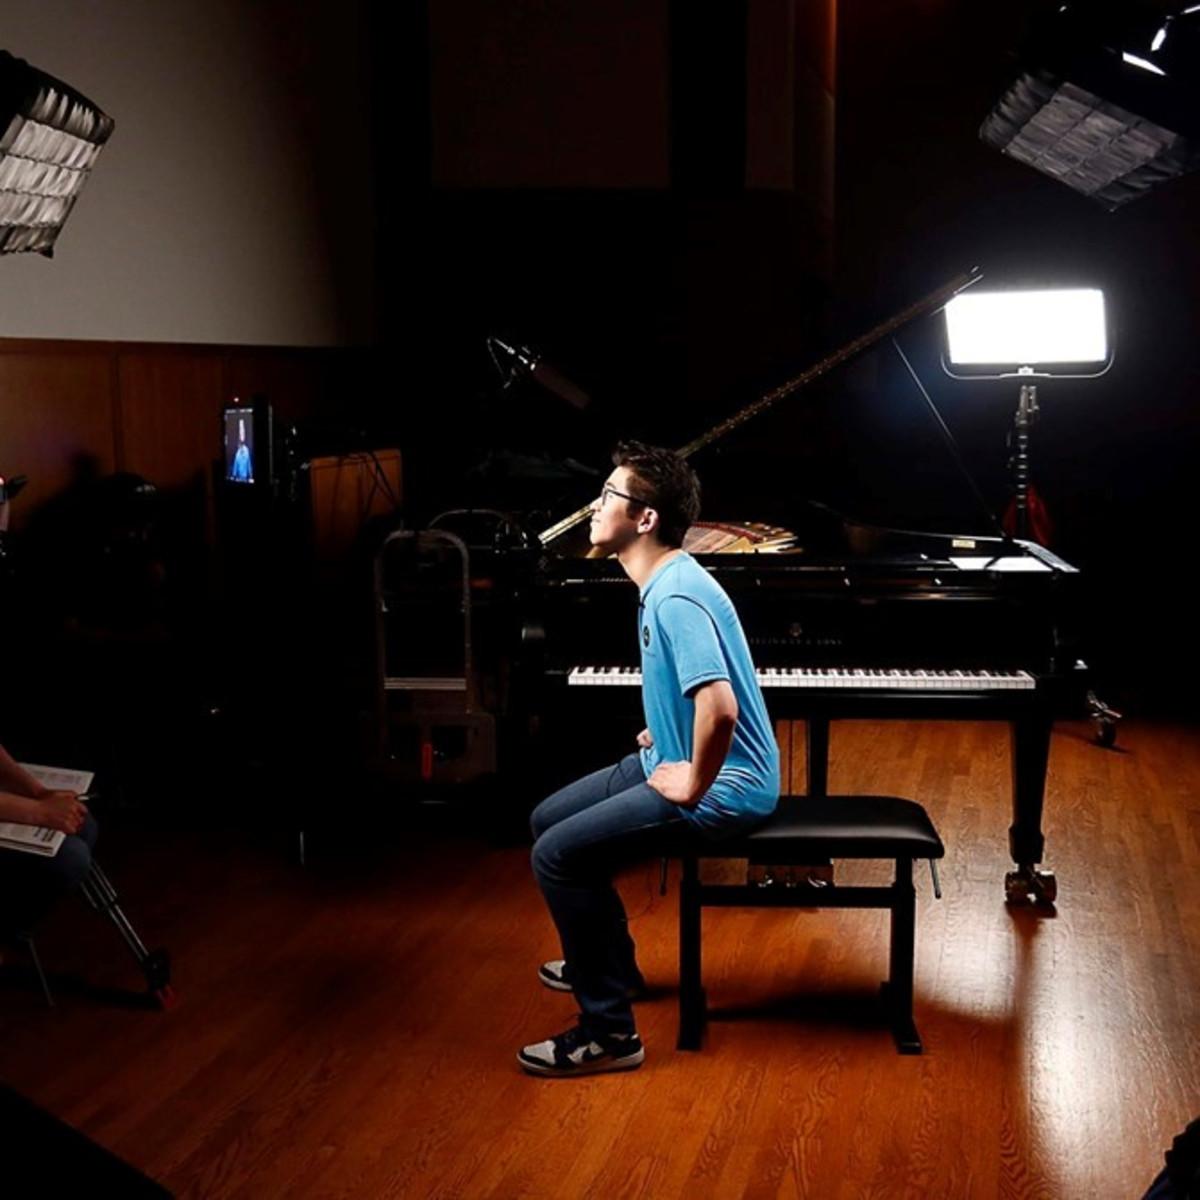 Jun Li Bui, Cliburn International Piano Competition webcast